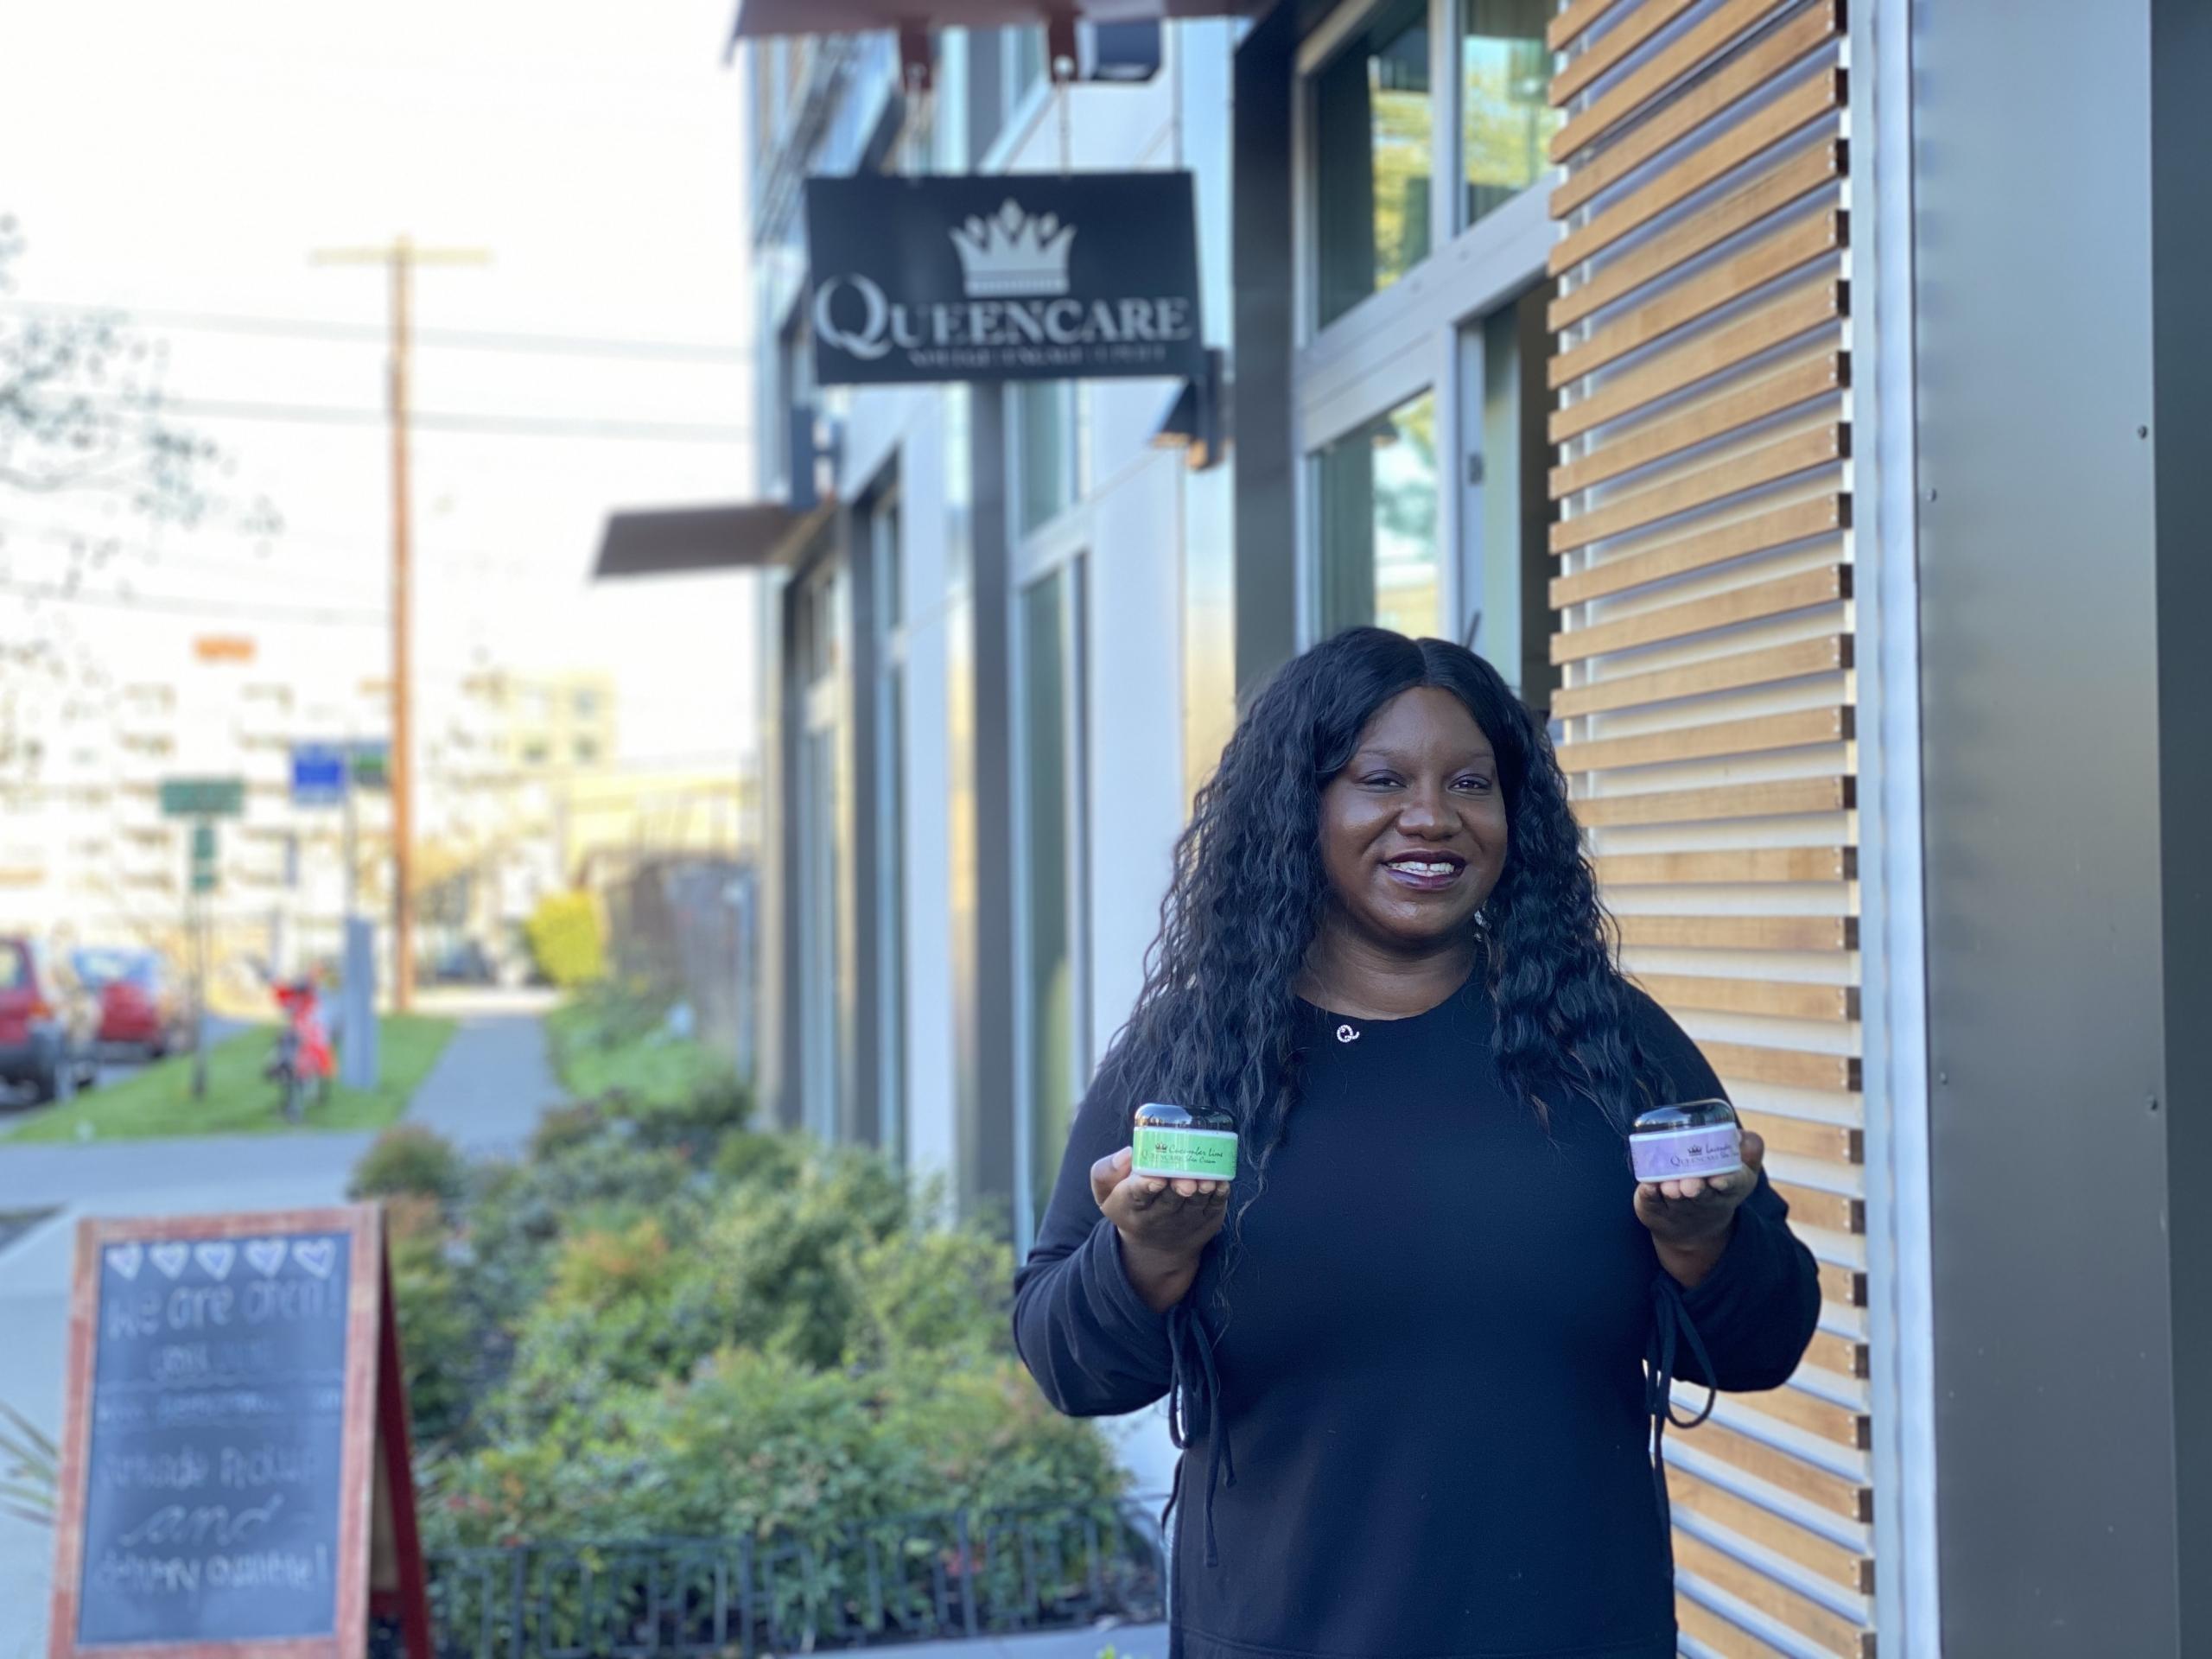 QueenCare founder, Monika Matthews